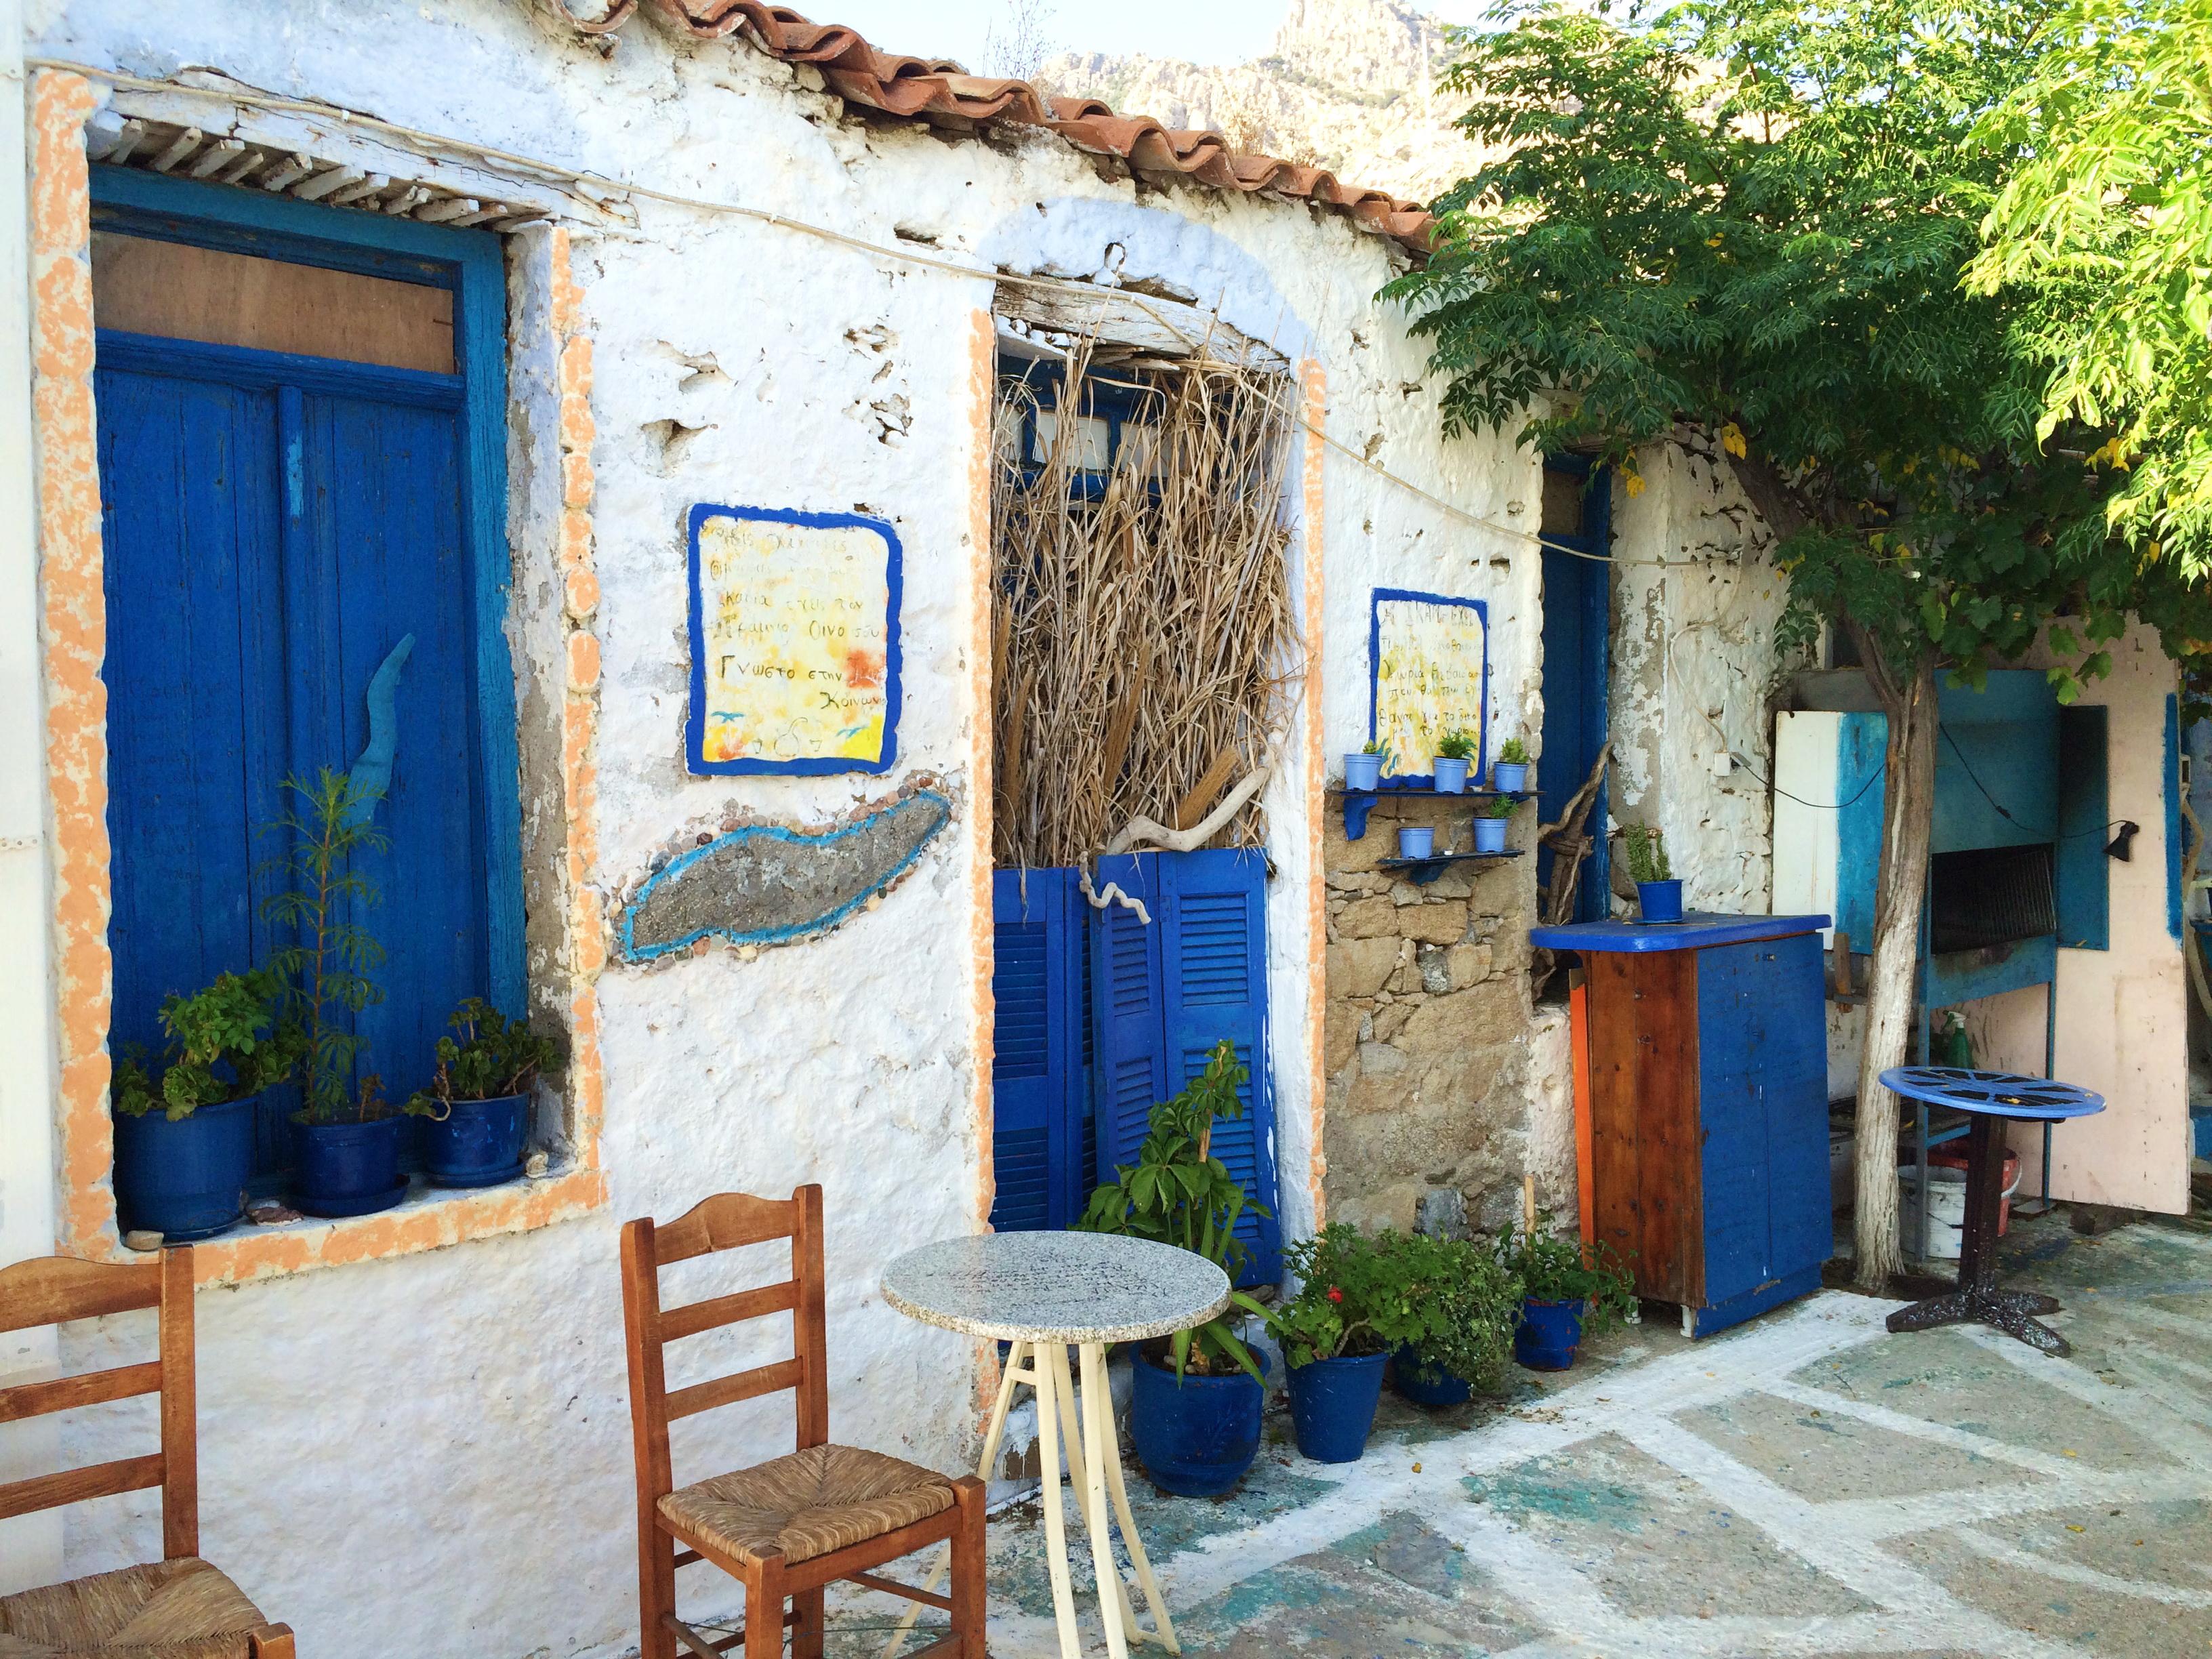 Holiday in Ikaria - Active vacation